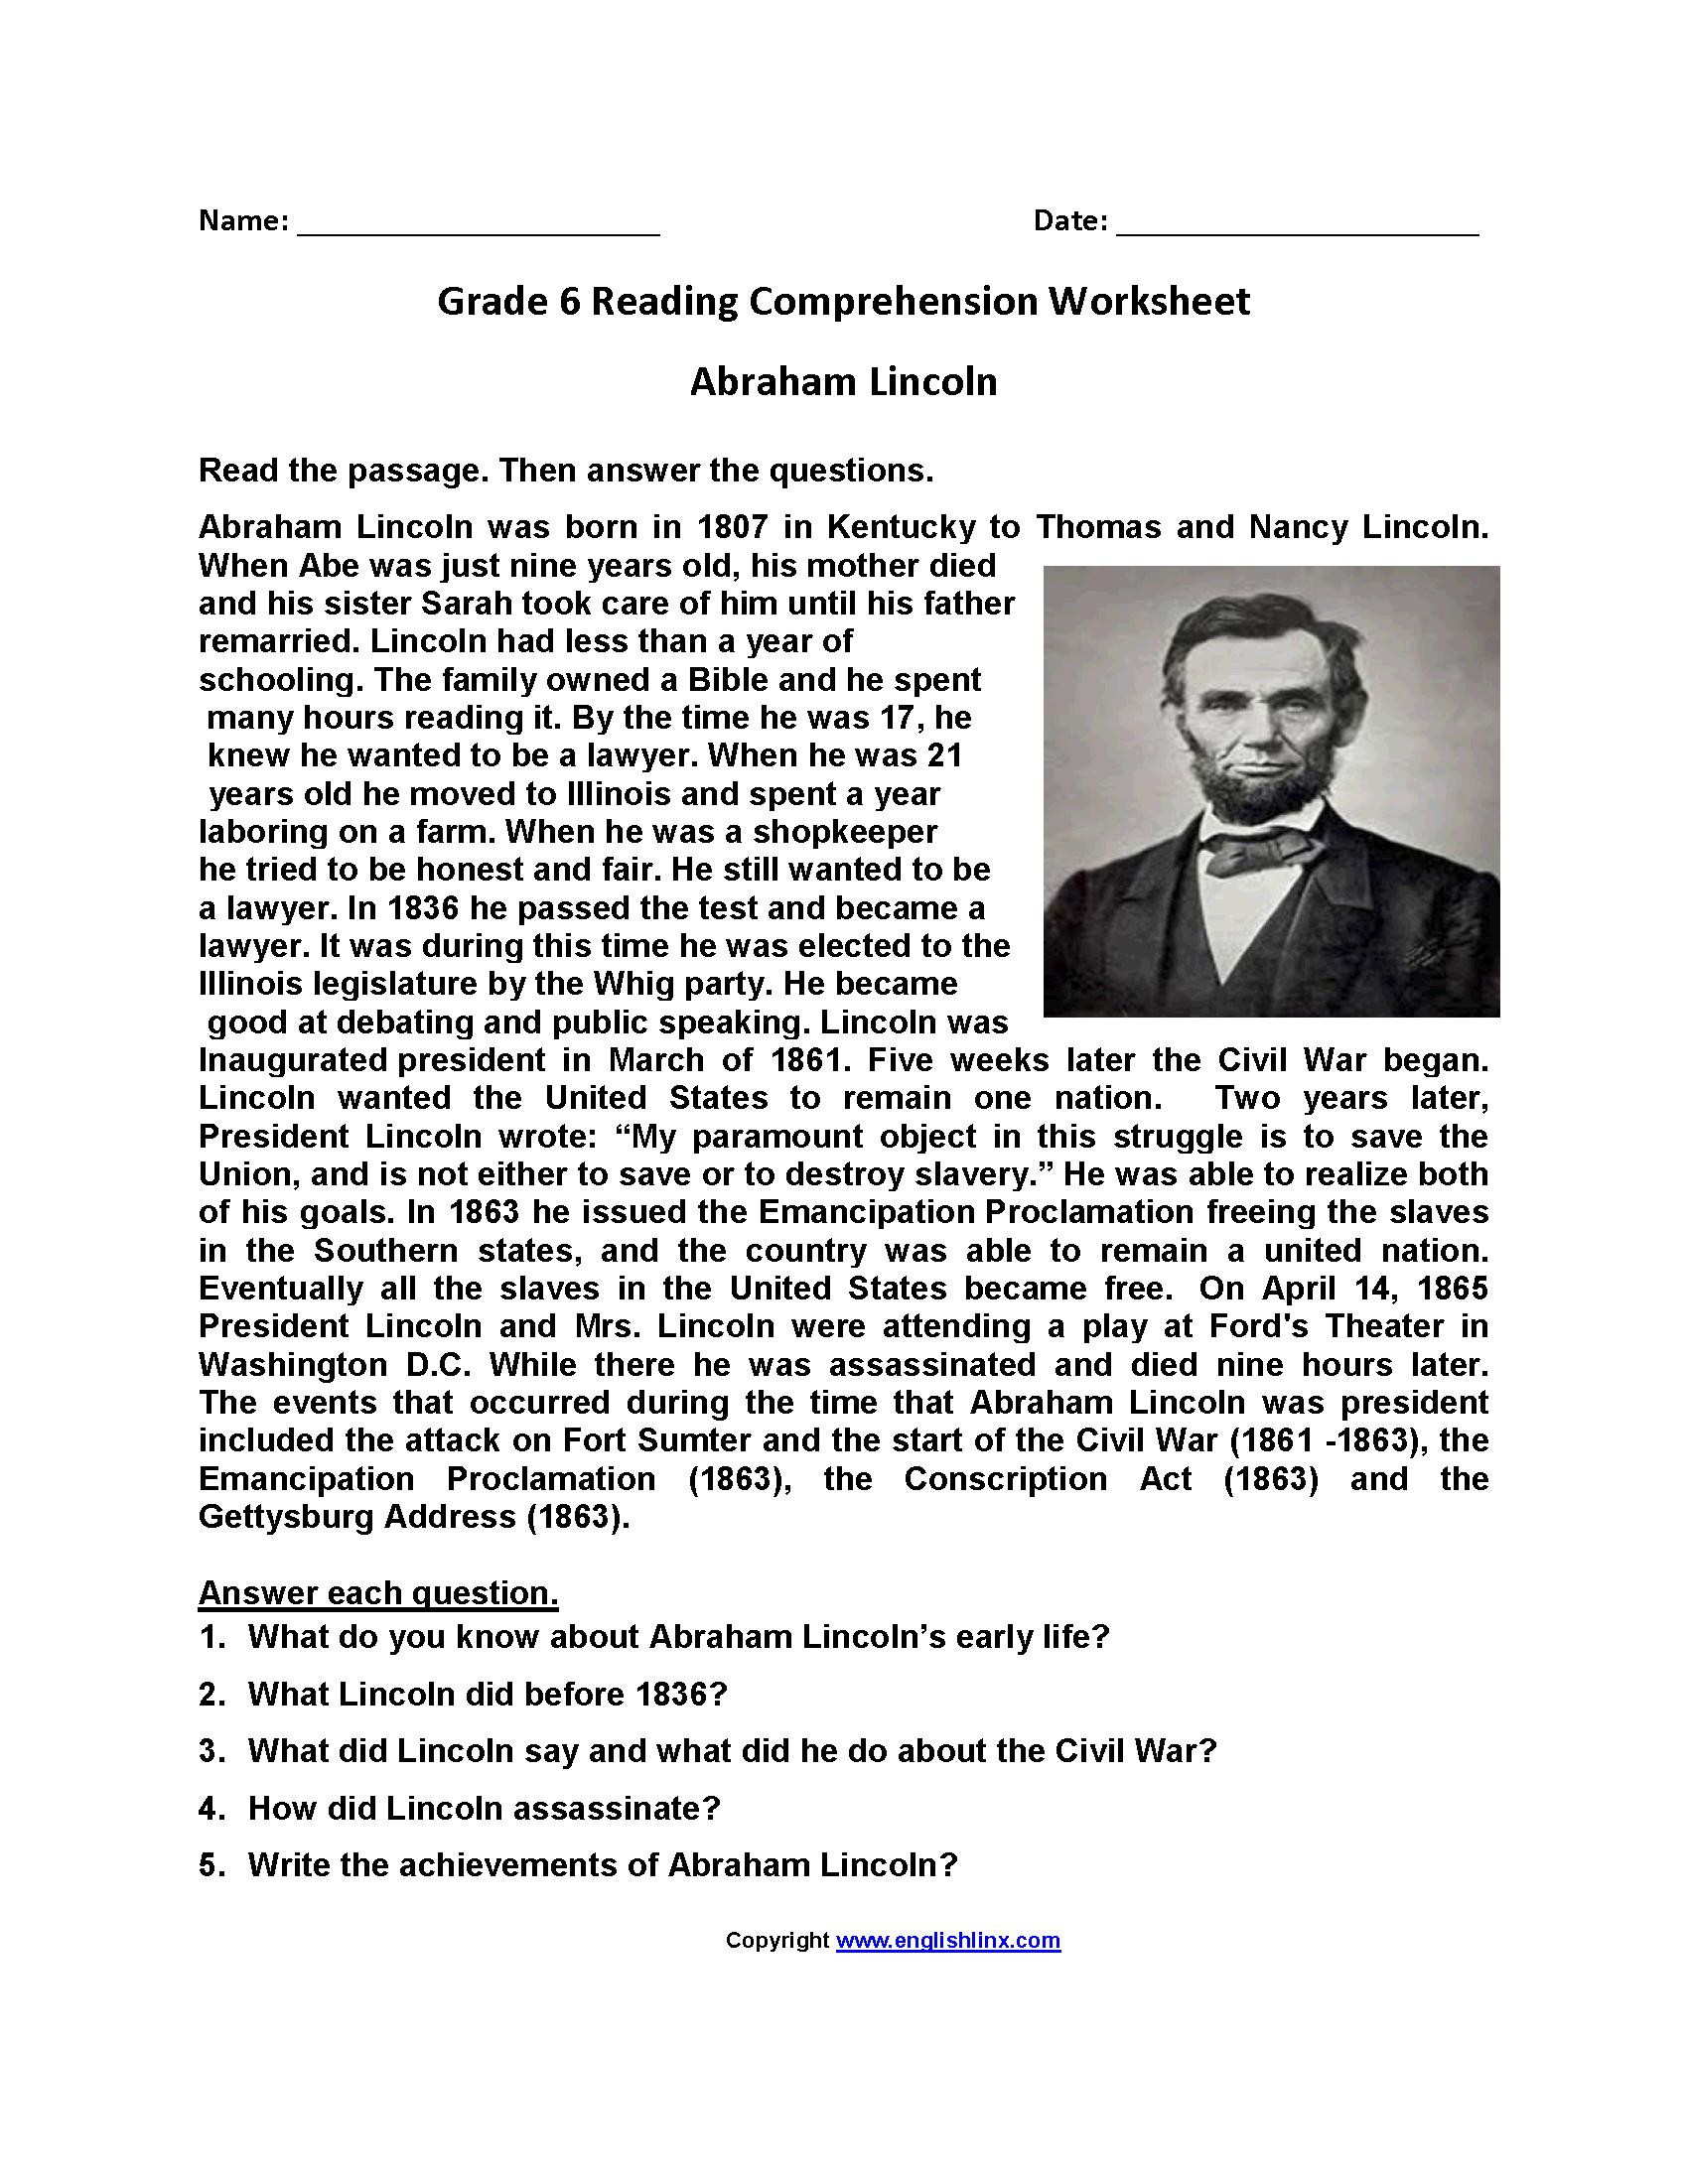 Reading Worksheets | Sixth Grade Reading Worksheets - Free Printable Comprehension Worksheets For Grade 5